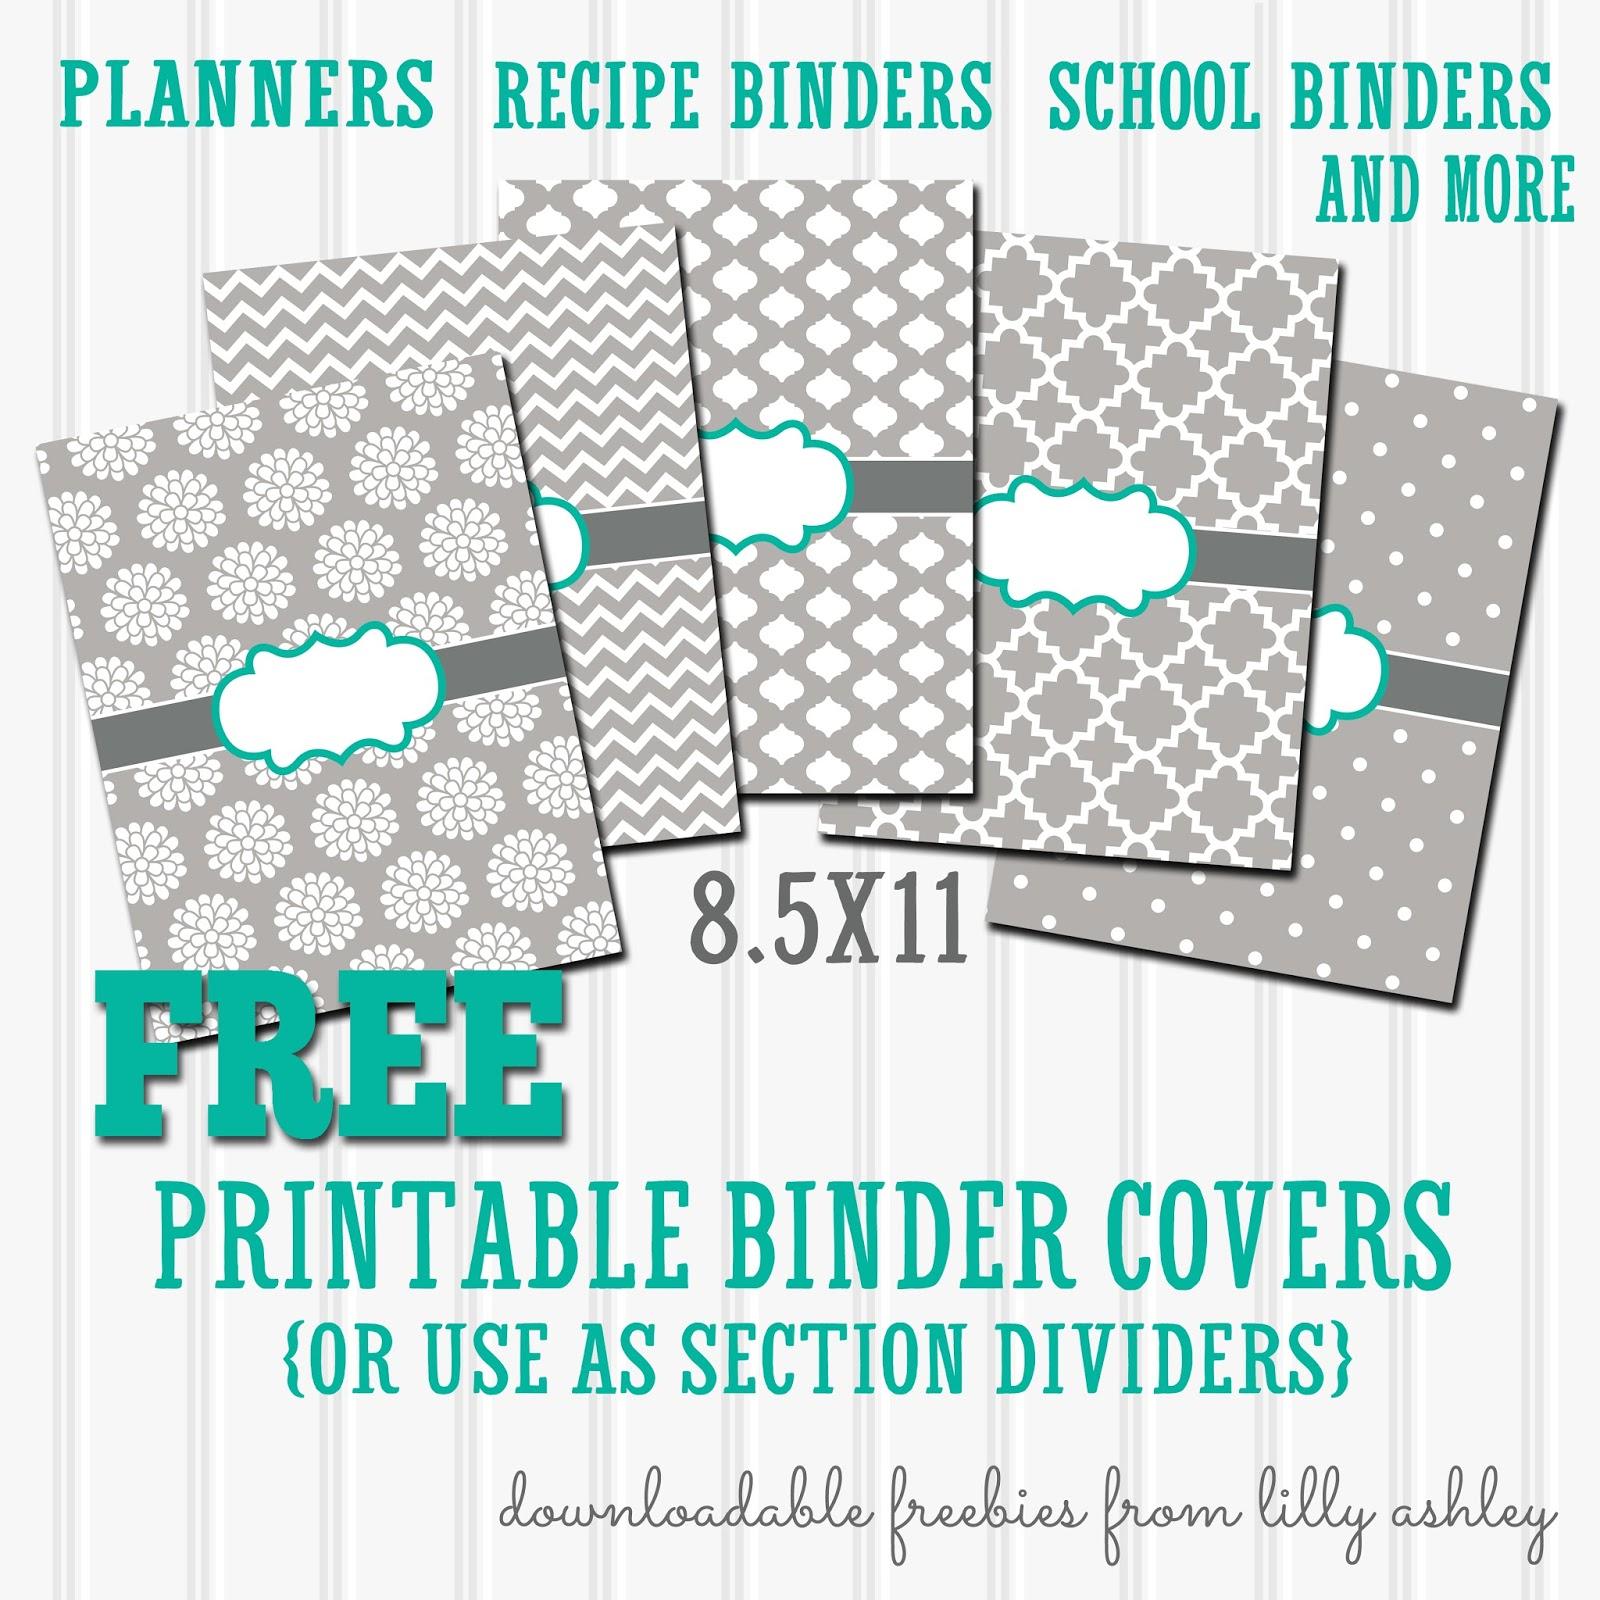 Make It Createlillyashleyfreebie Downloads: Free Binder - Free Printable Binder Covers And Spines